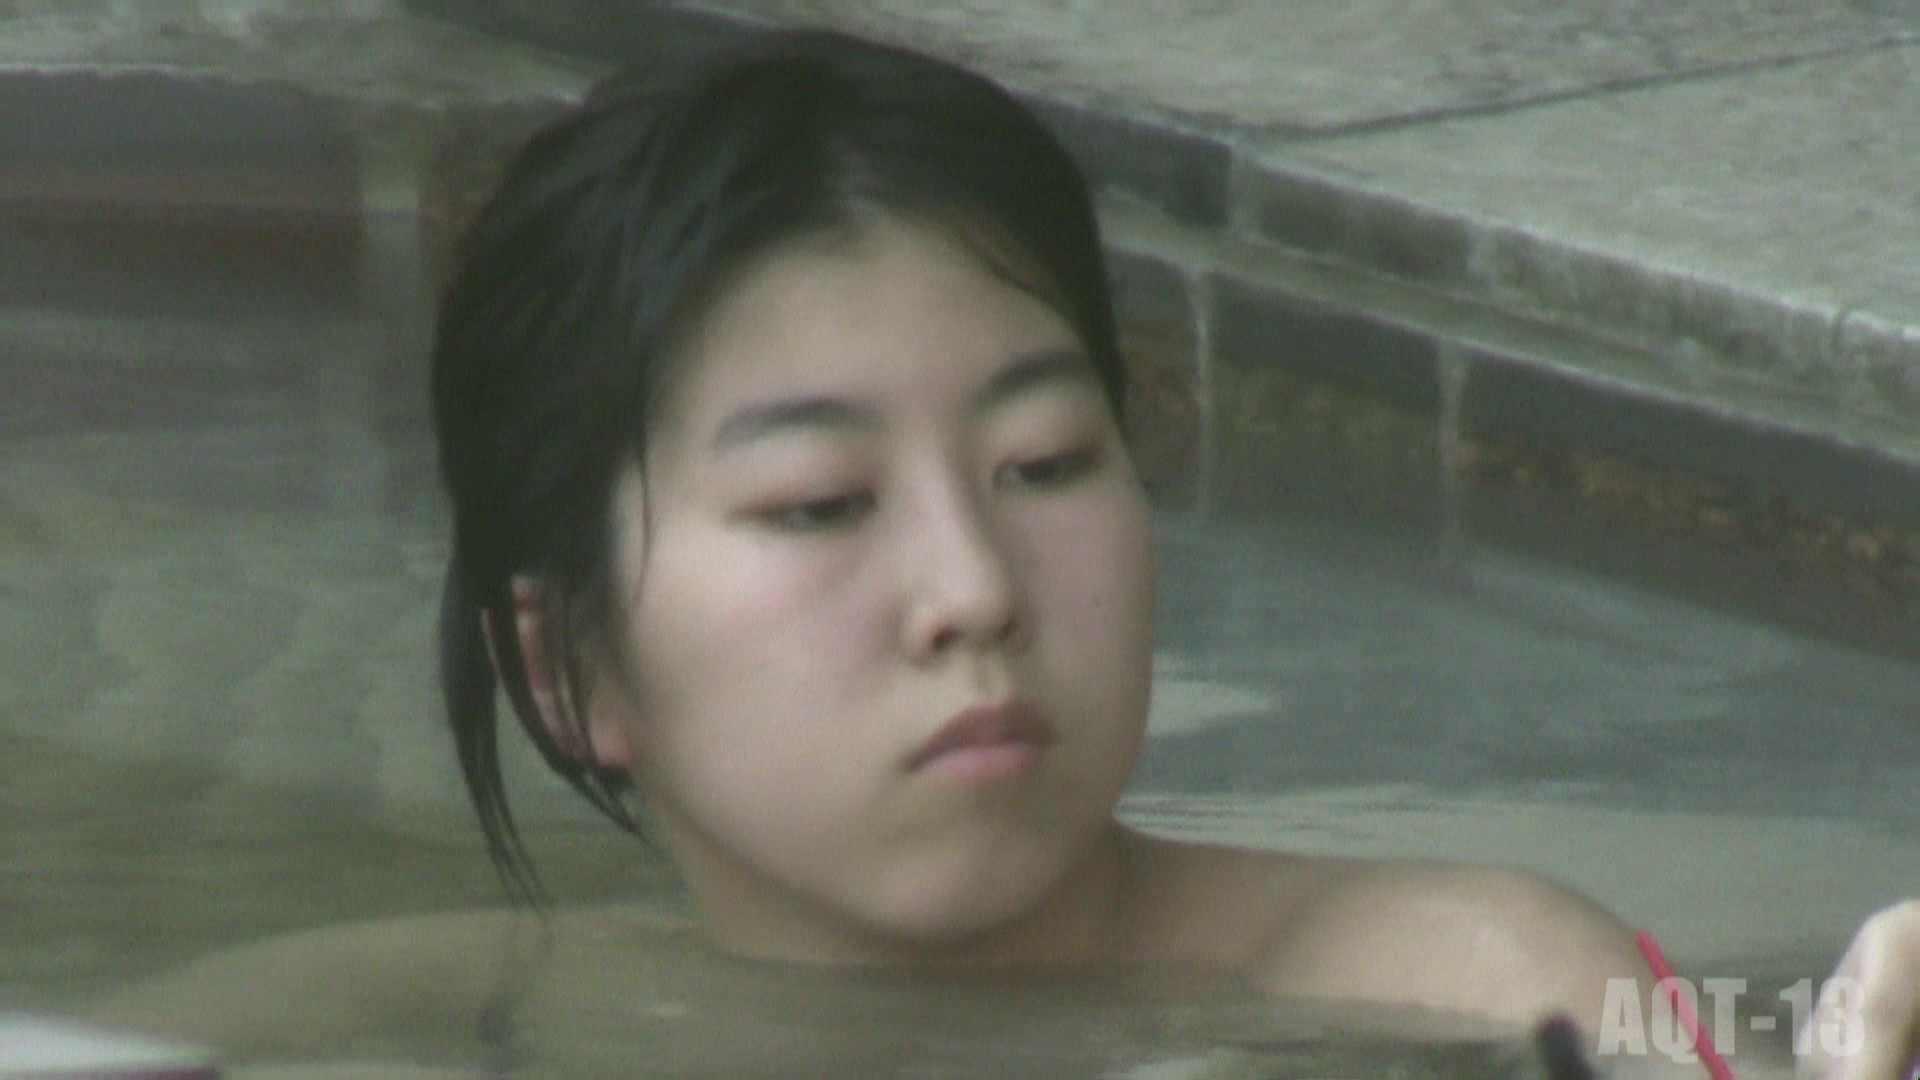 Aquaな露天風呂Vol.816 盗撮   OLエロ画像  105PICs 31